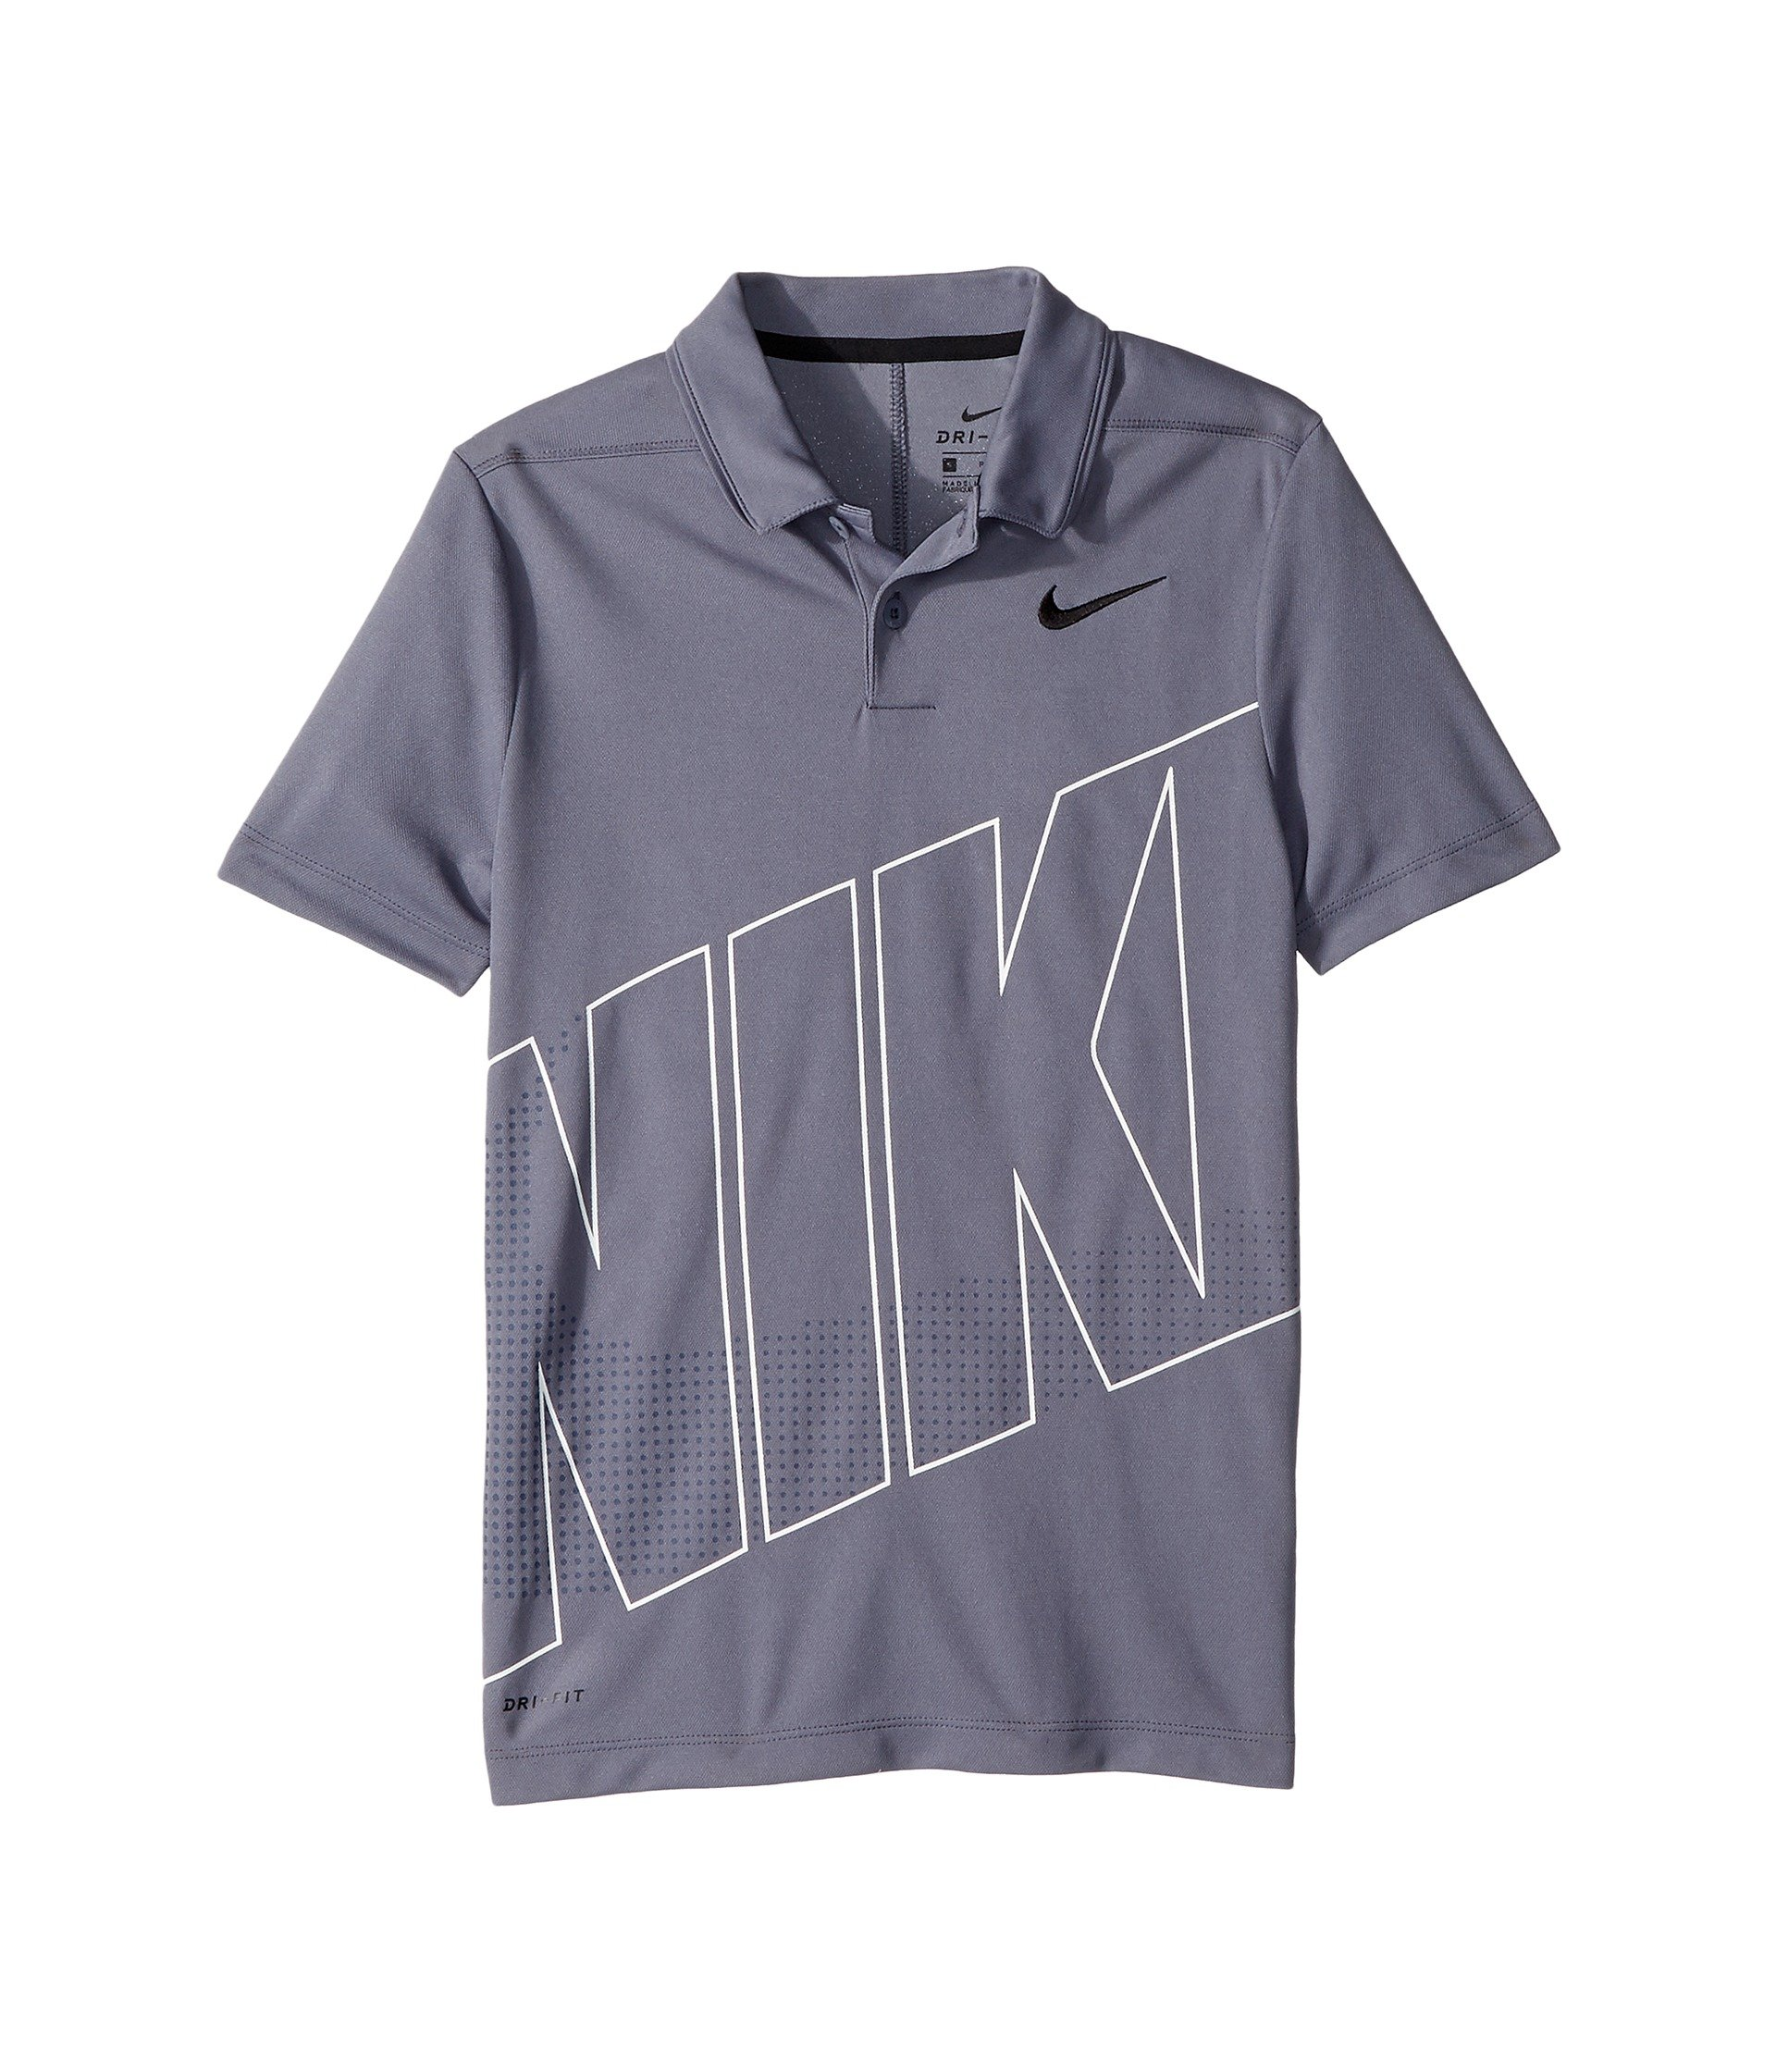 Nike New Boys DRI FIT Essential GRFX 2 Golf Polo (Gray, Small)